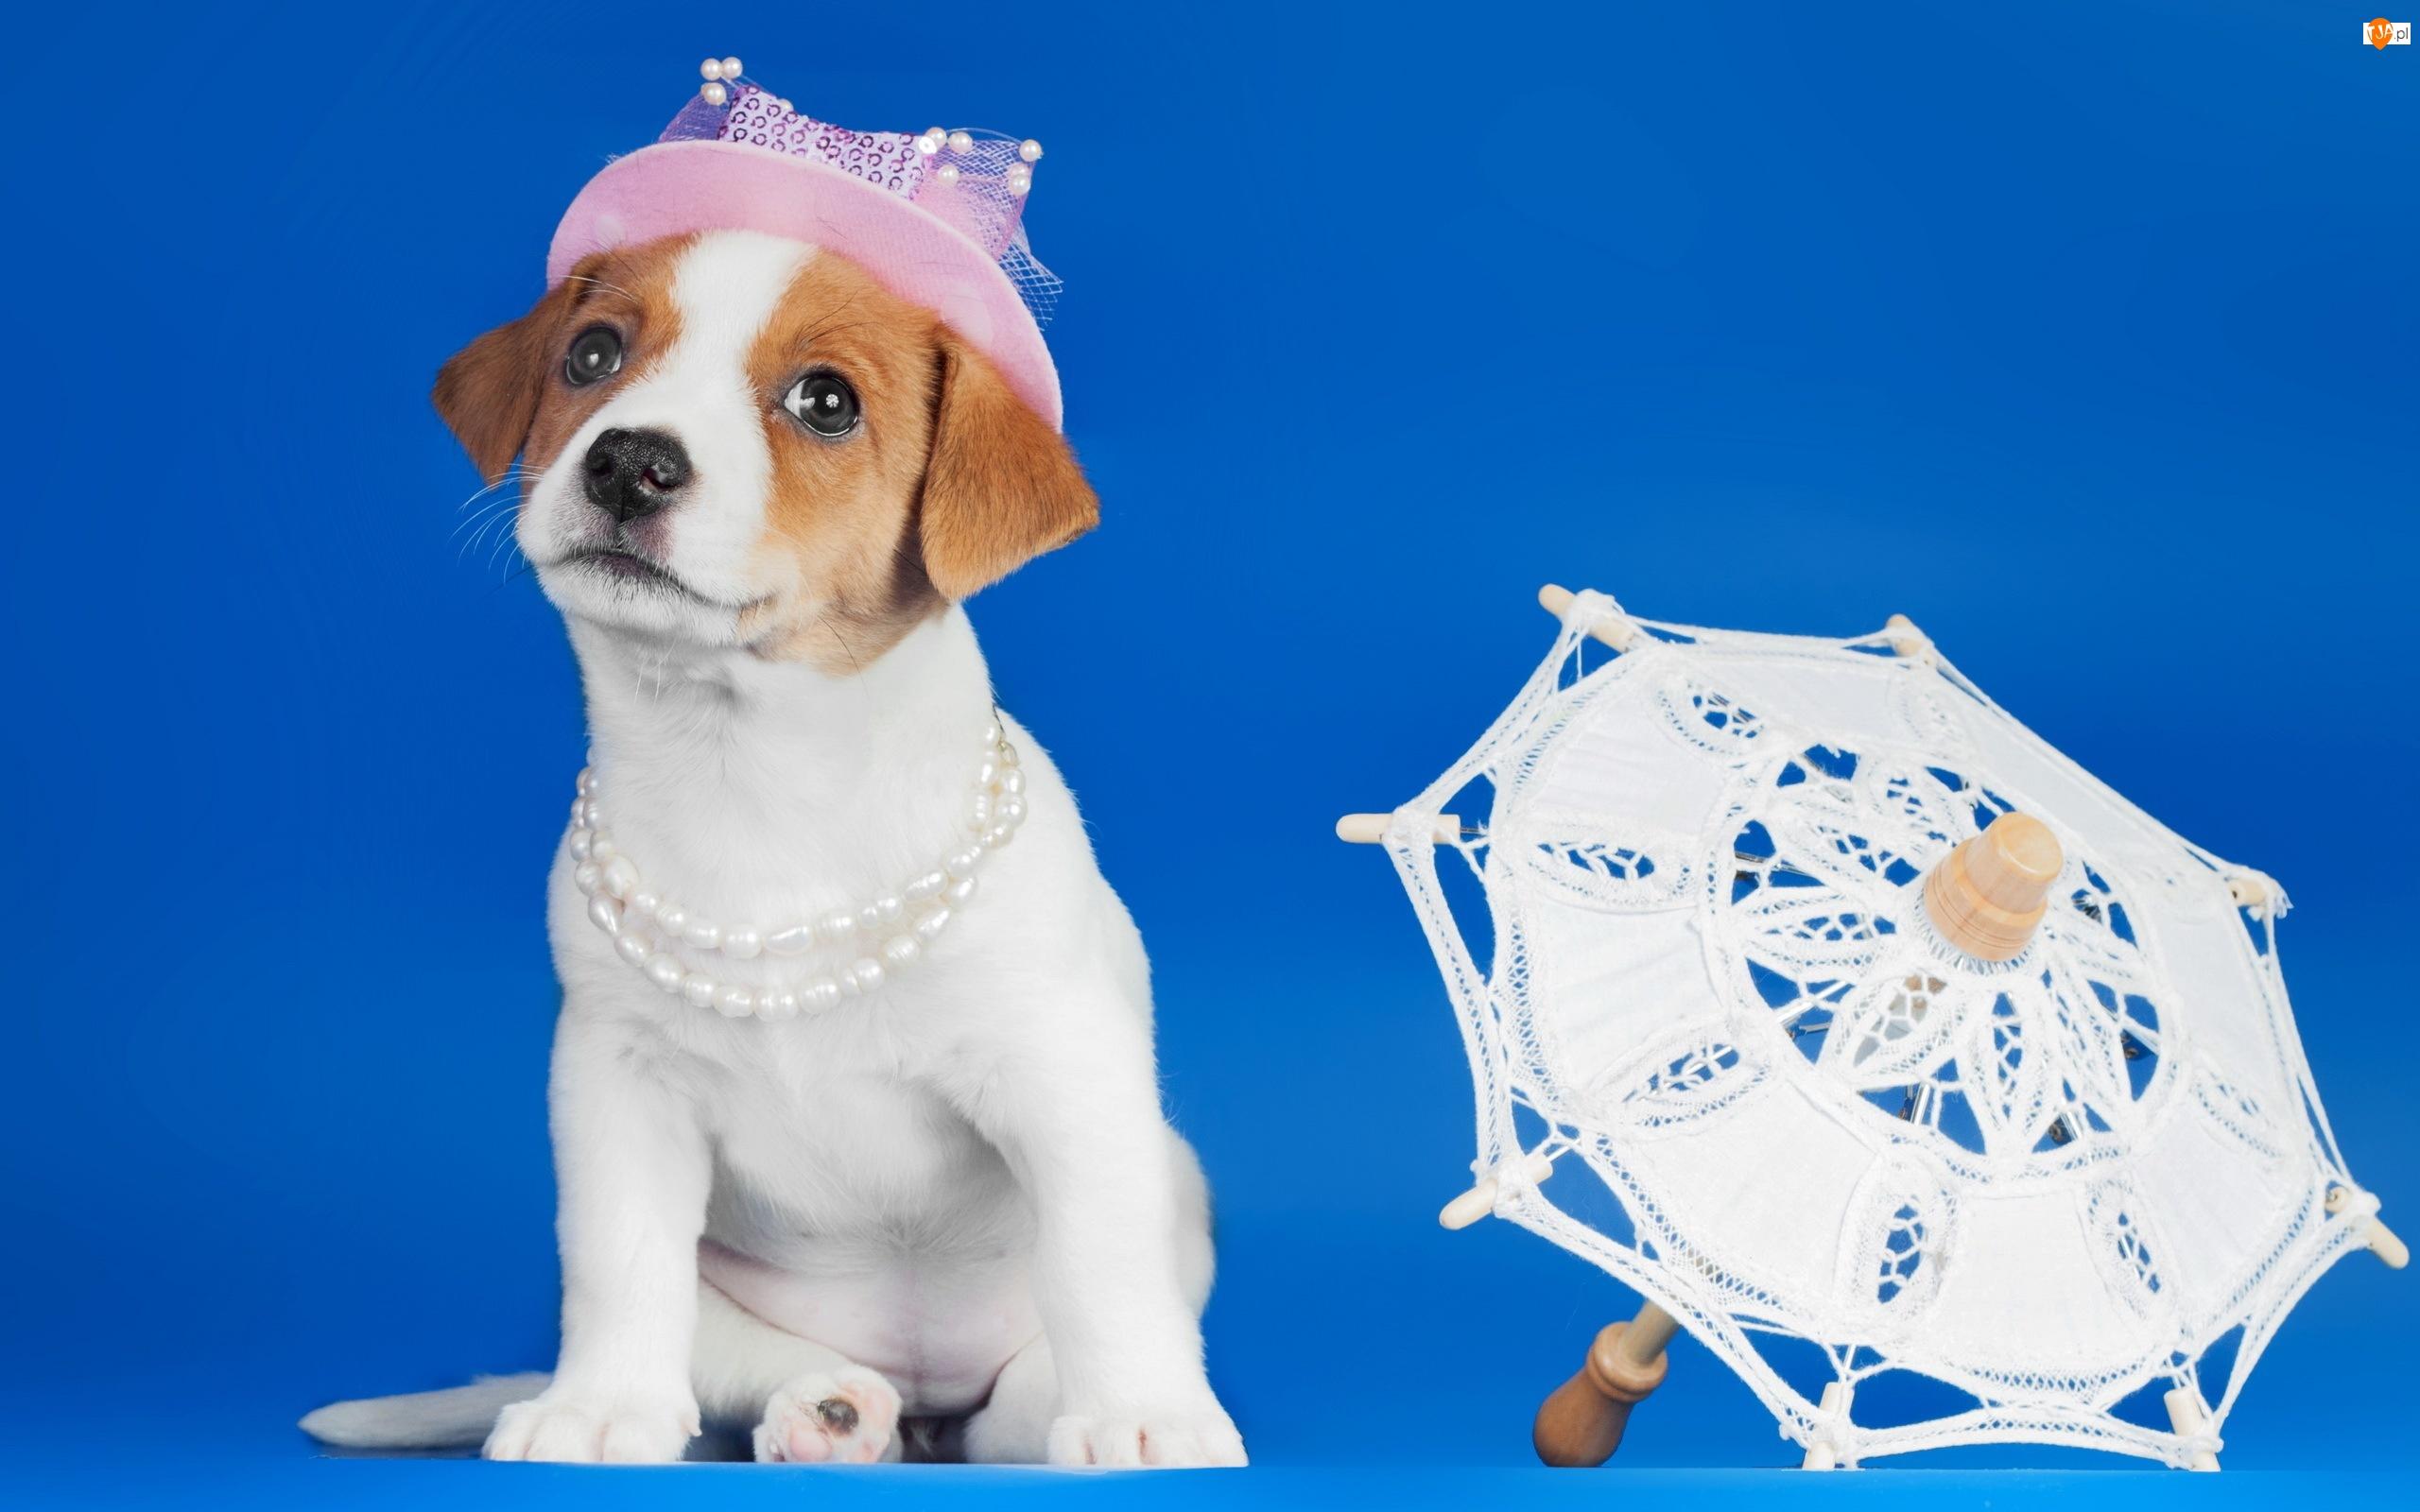 Pies, Parasol, Jack russell terrier, Kapelusz